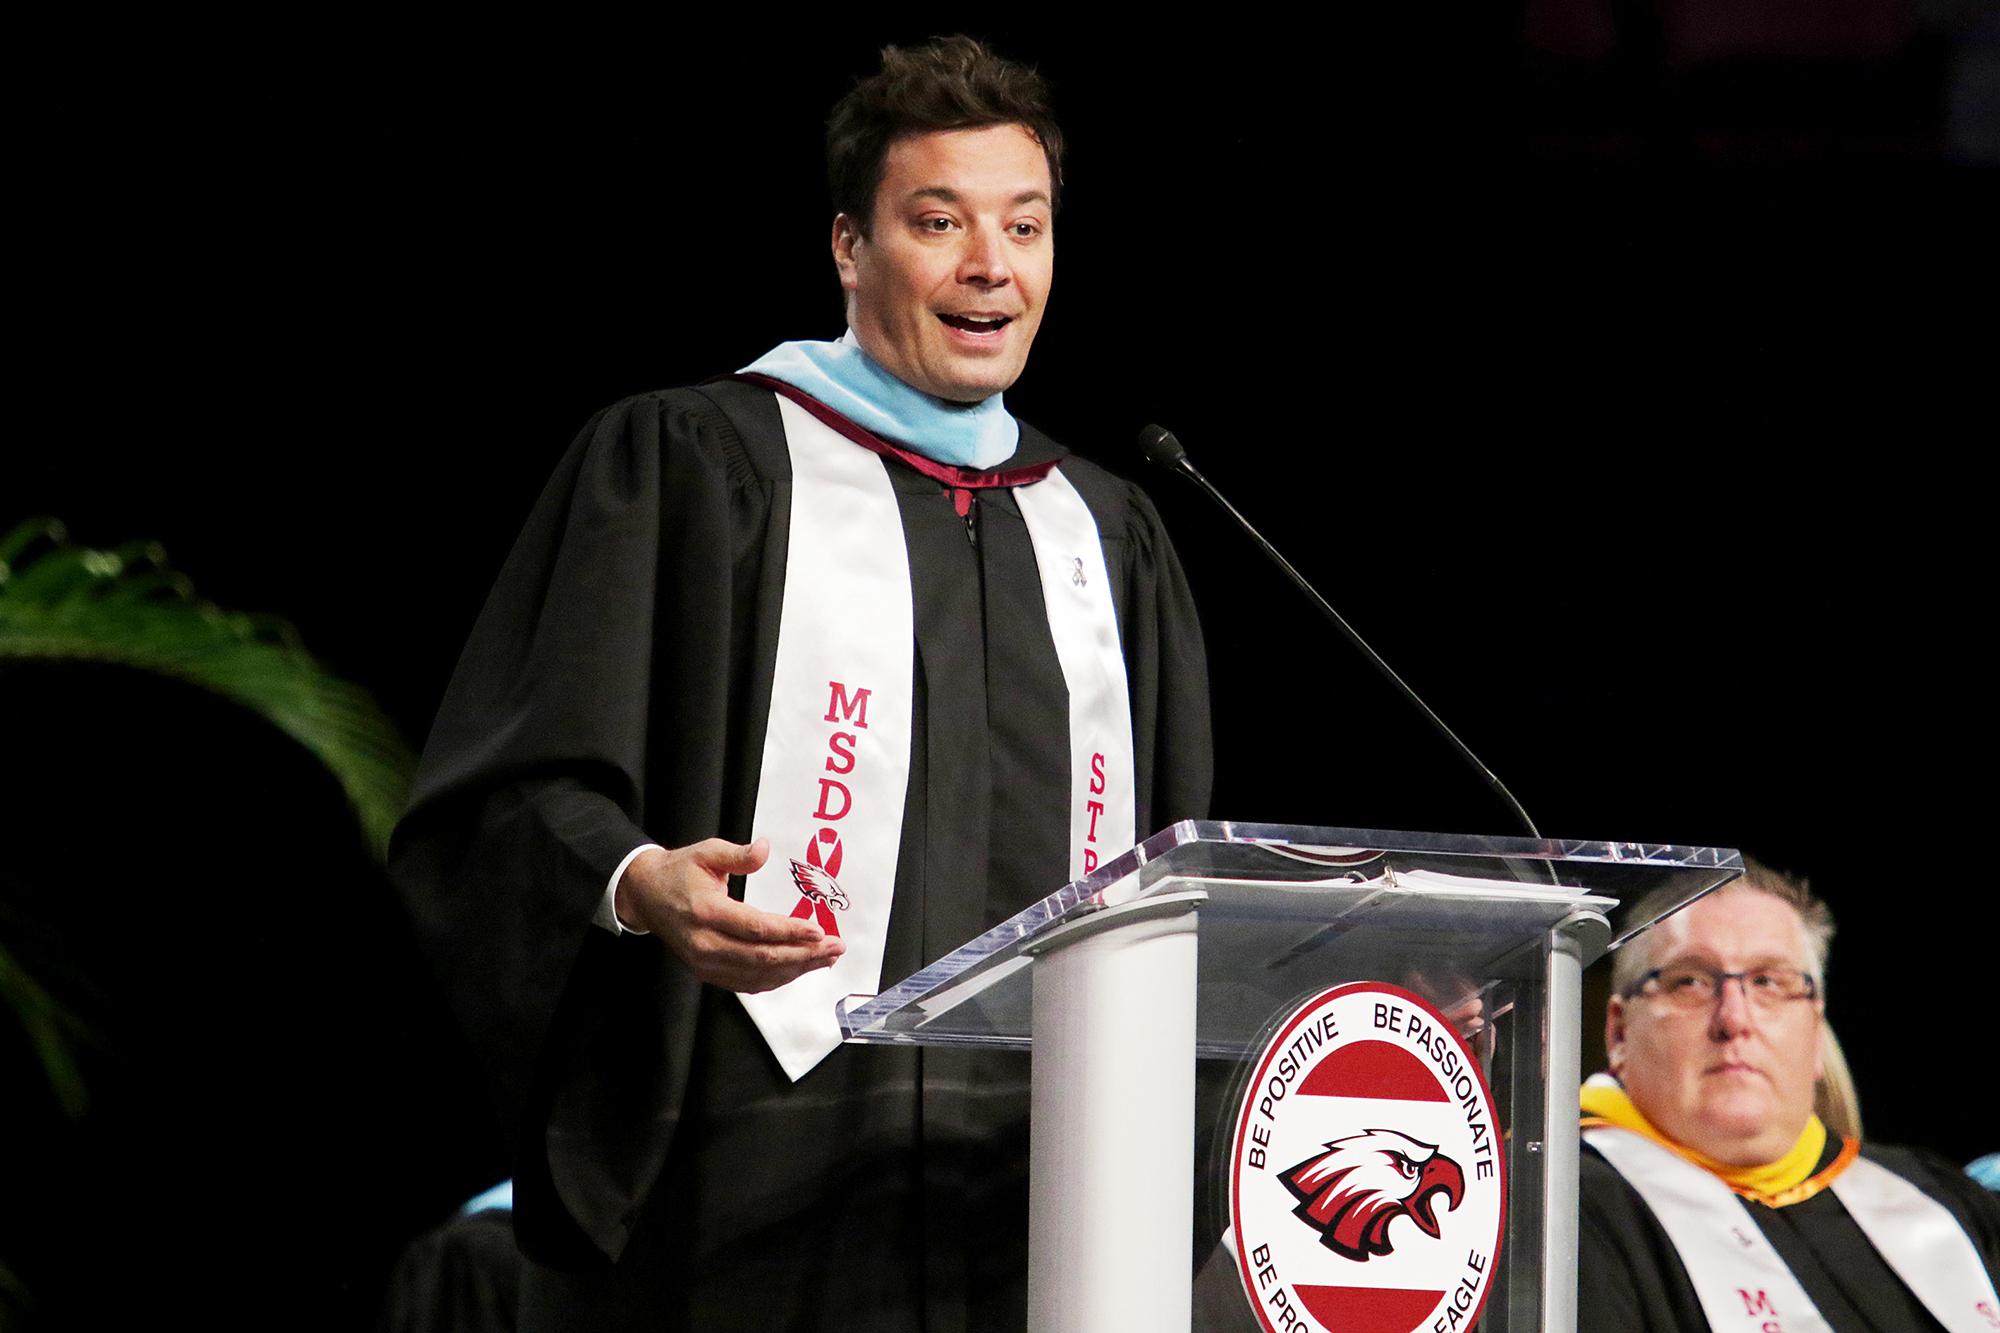 Jimmy Fallon Marjory Stoneman Douglas High School graduation speech